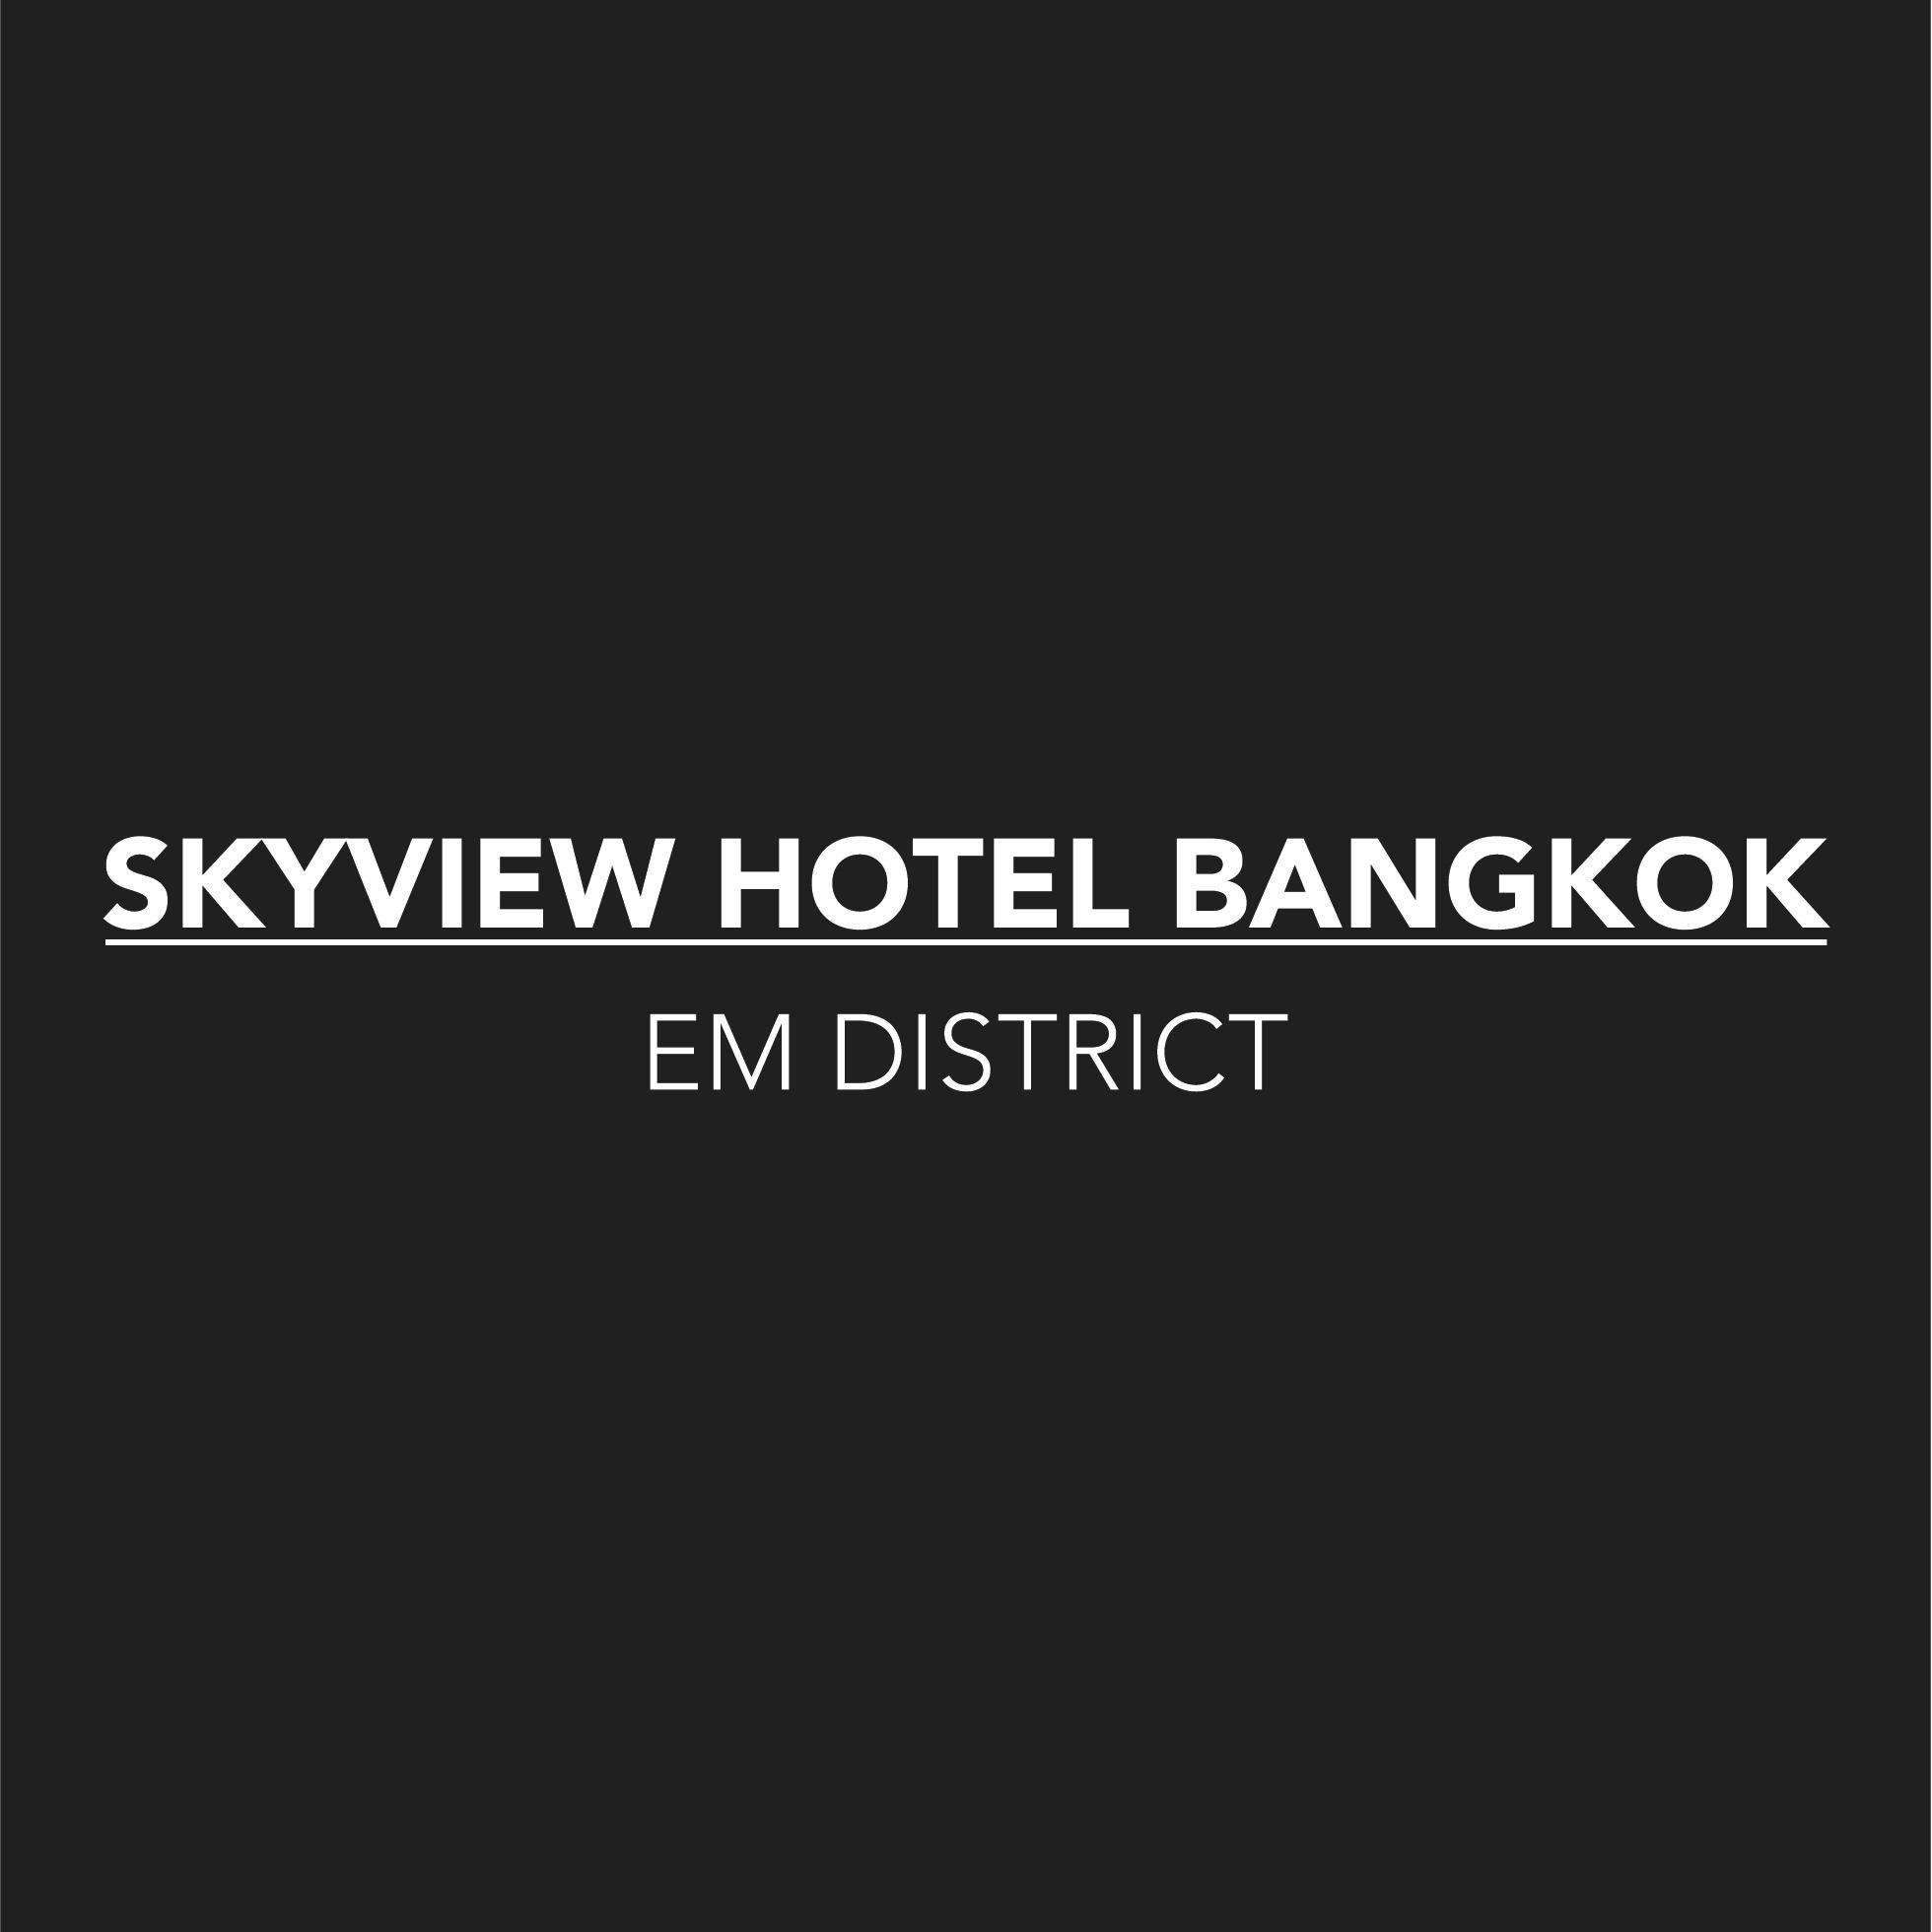 SKYVIEW Hotel Bangkok (EMDistrict)